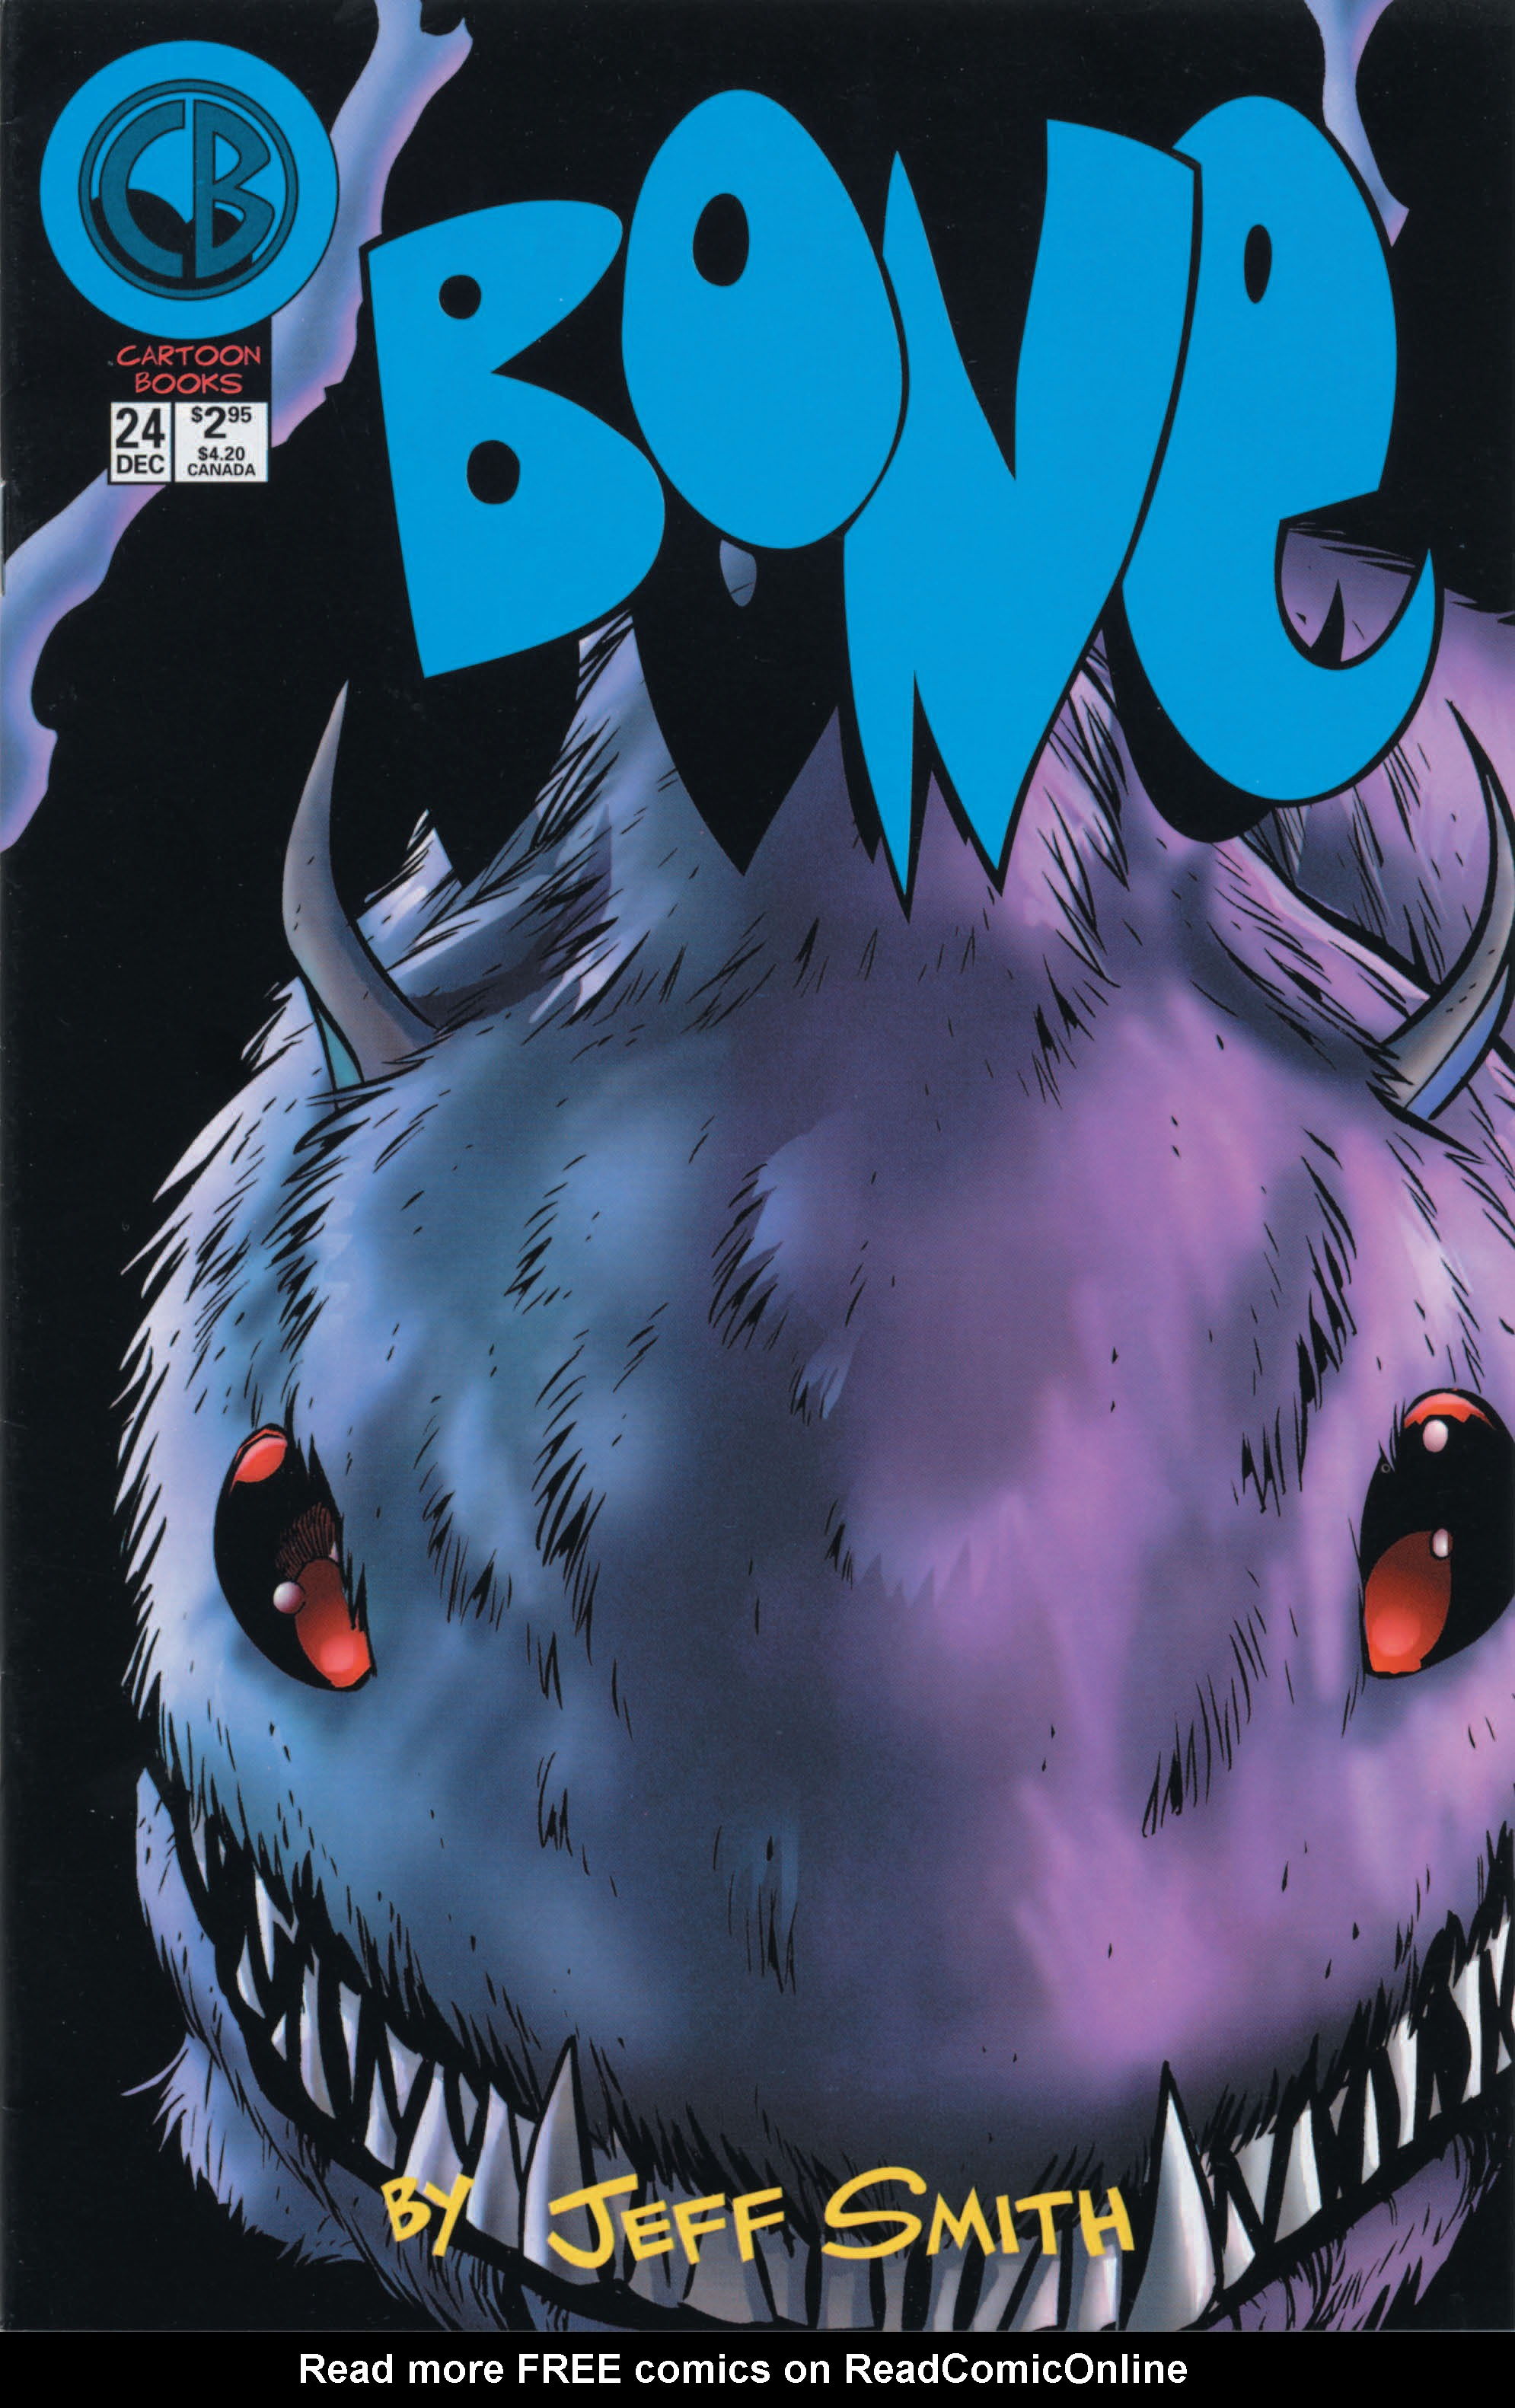 Bone 1991 Issue 24